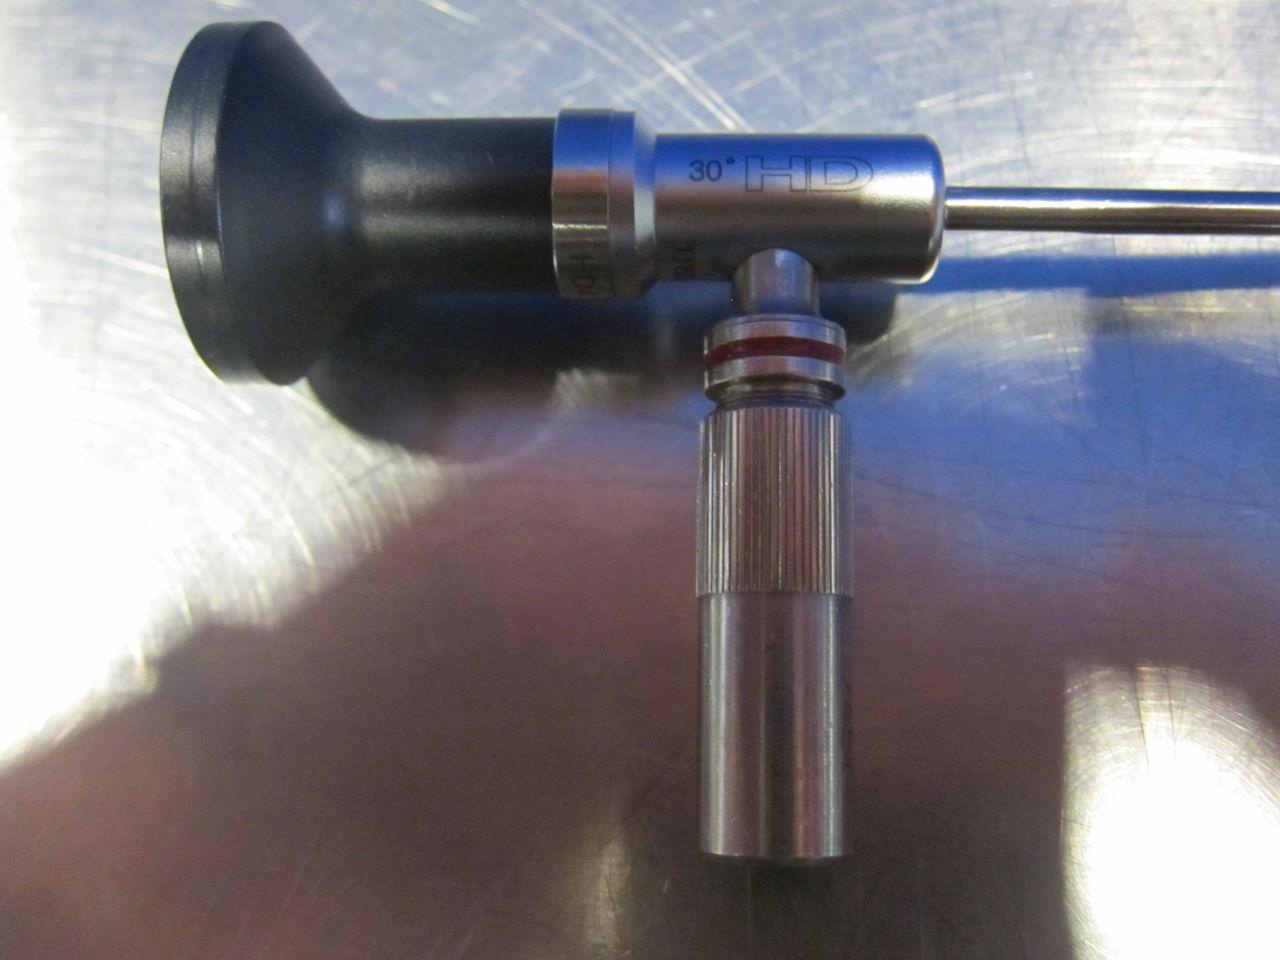 LINVATEC HD4300 Arthroscope